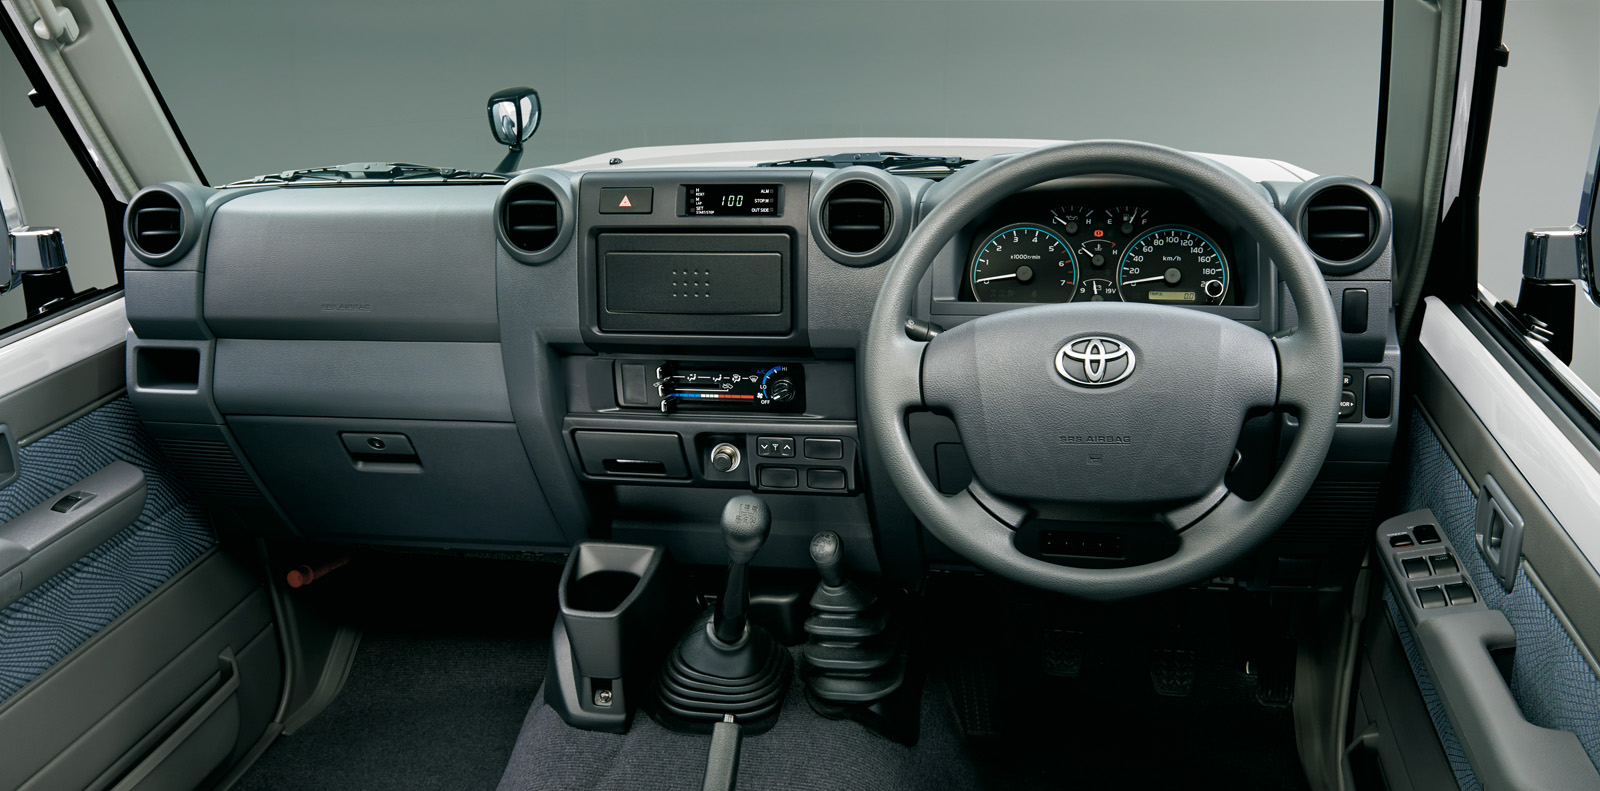 Land Cruiser J70 >> 2015-Toyota-Land-Cruiser-70-Interior.jpg - Japanese Car Auctions - Integrity Exports